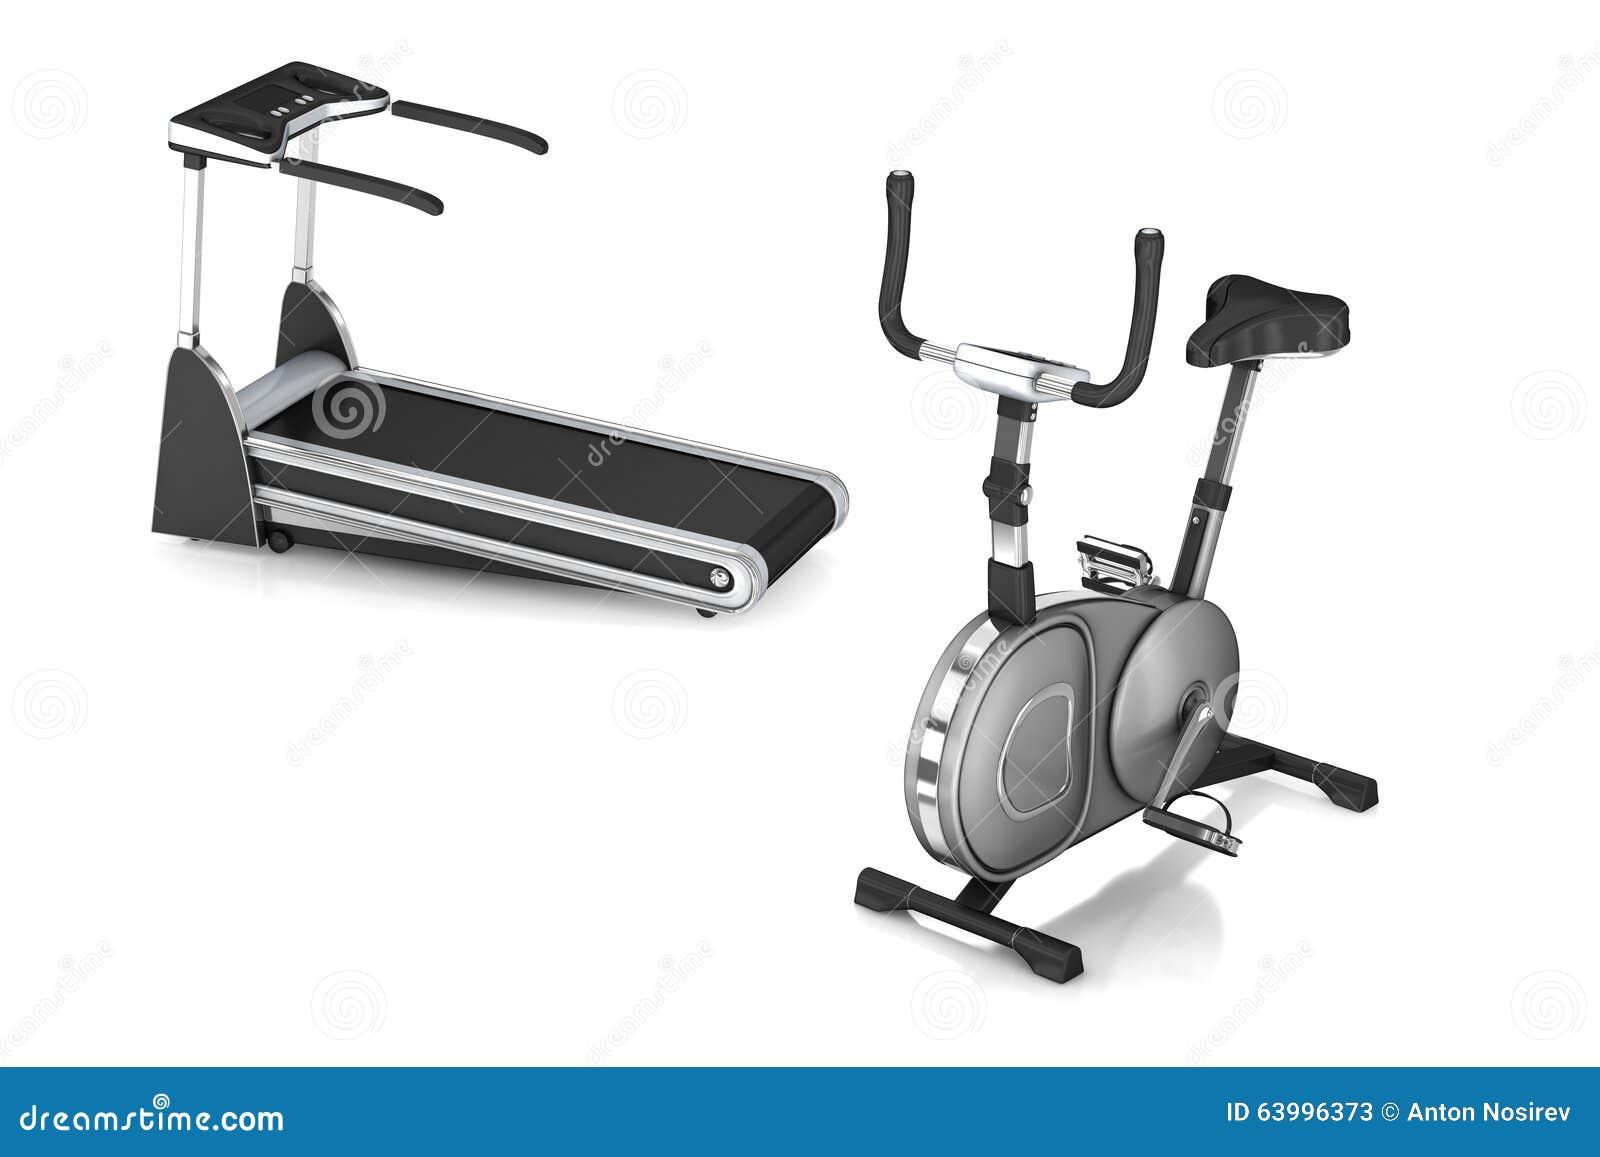 and treadmill bike Stationary